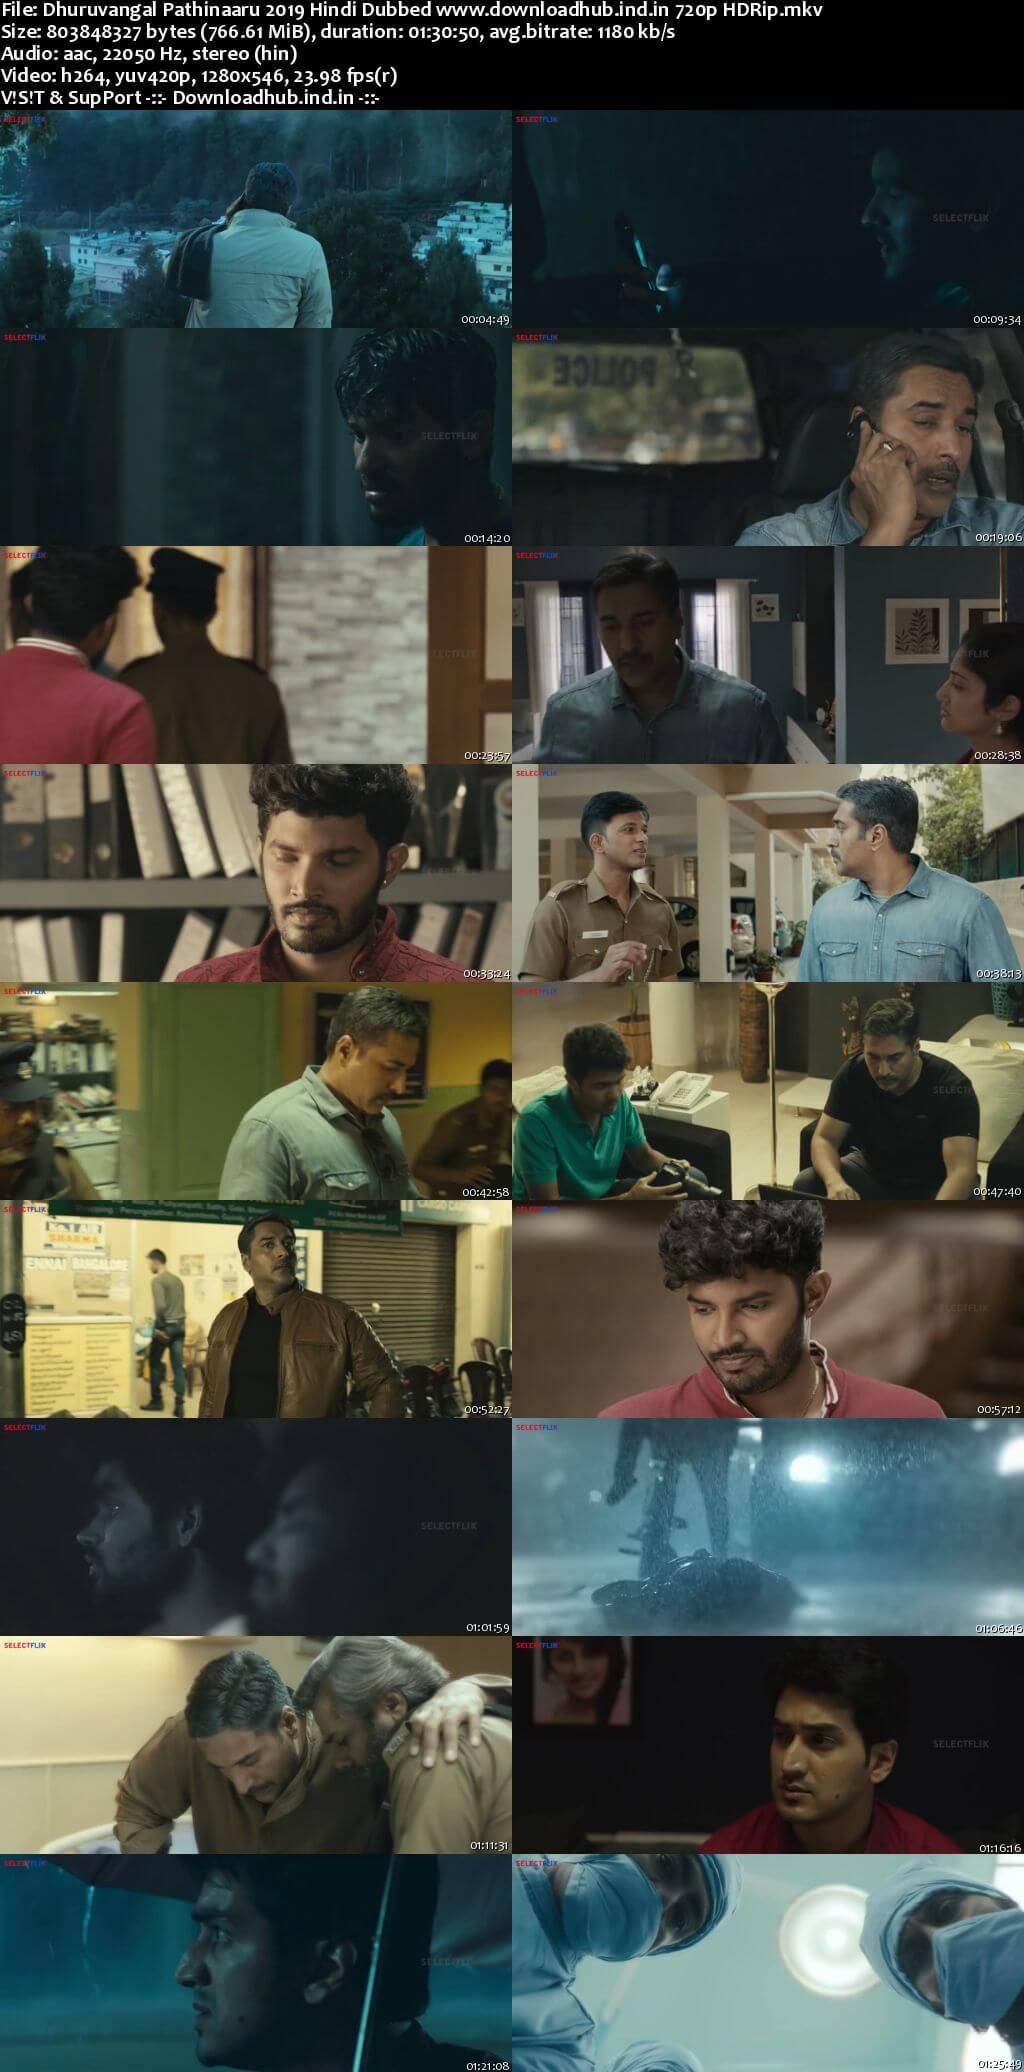 Dhuruvangal Pathinaaru 2019 Hindi Dubbed 720p HDRip x264